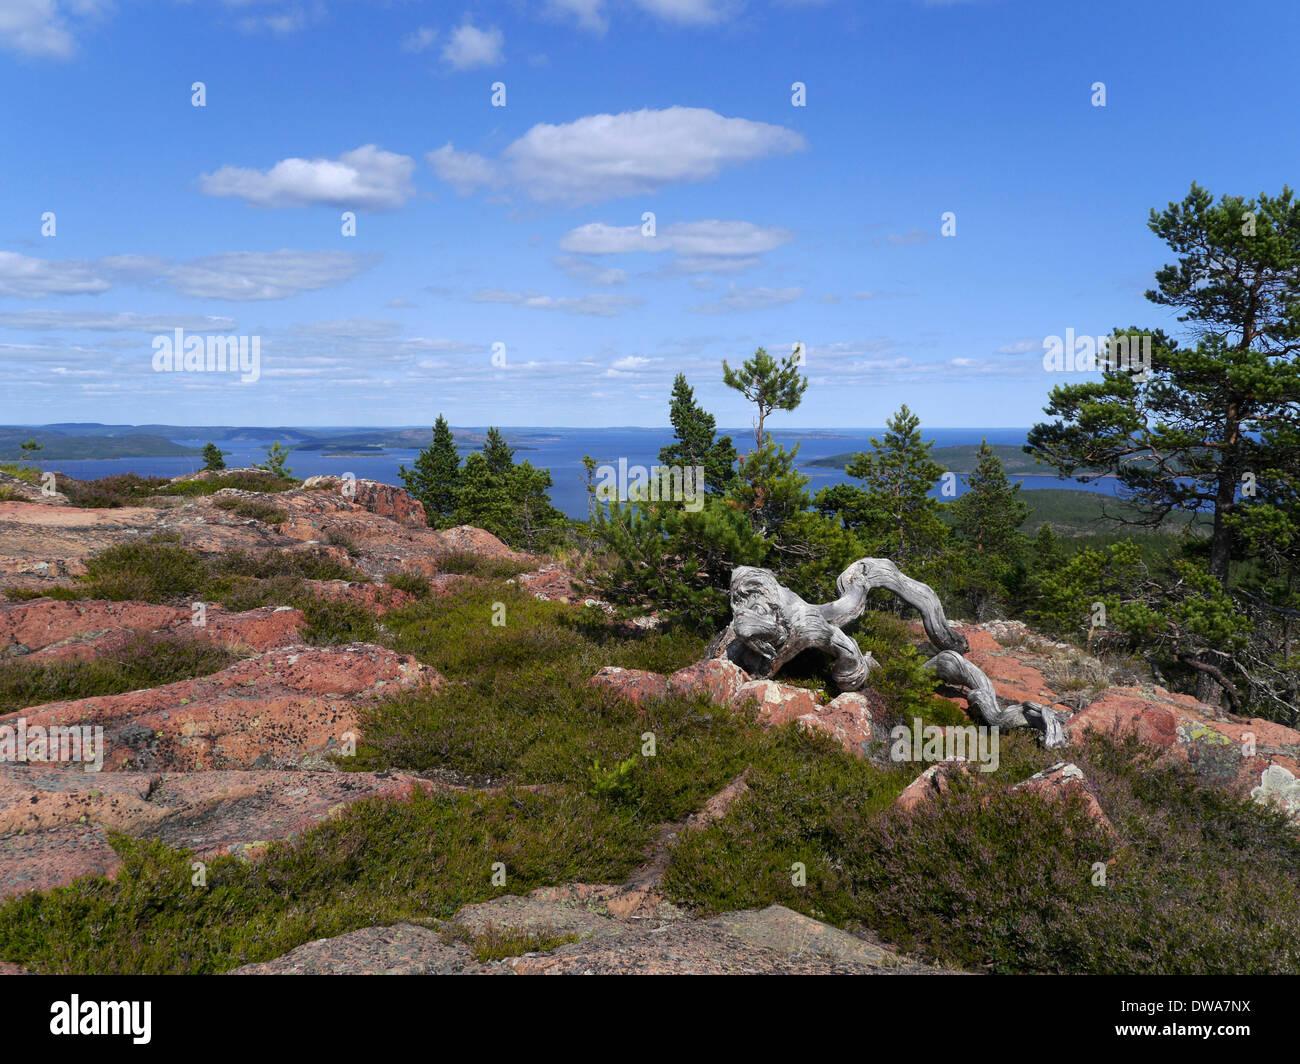 mjältön, höga kusten (high coast), västernorrlands län, gulf of bothnia, sweden - Stock Image